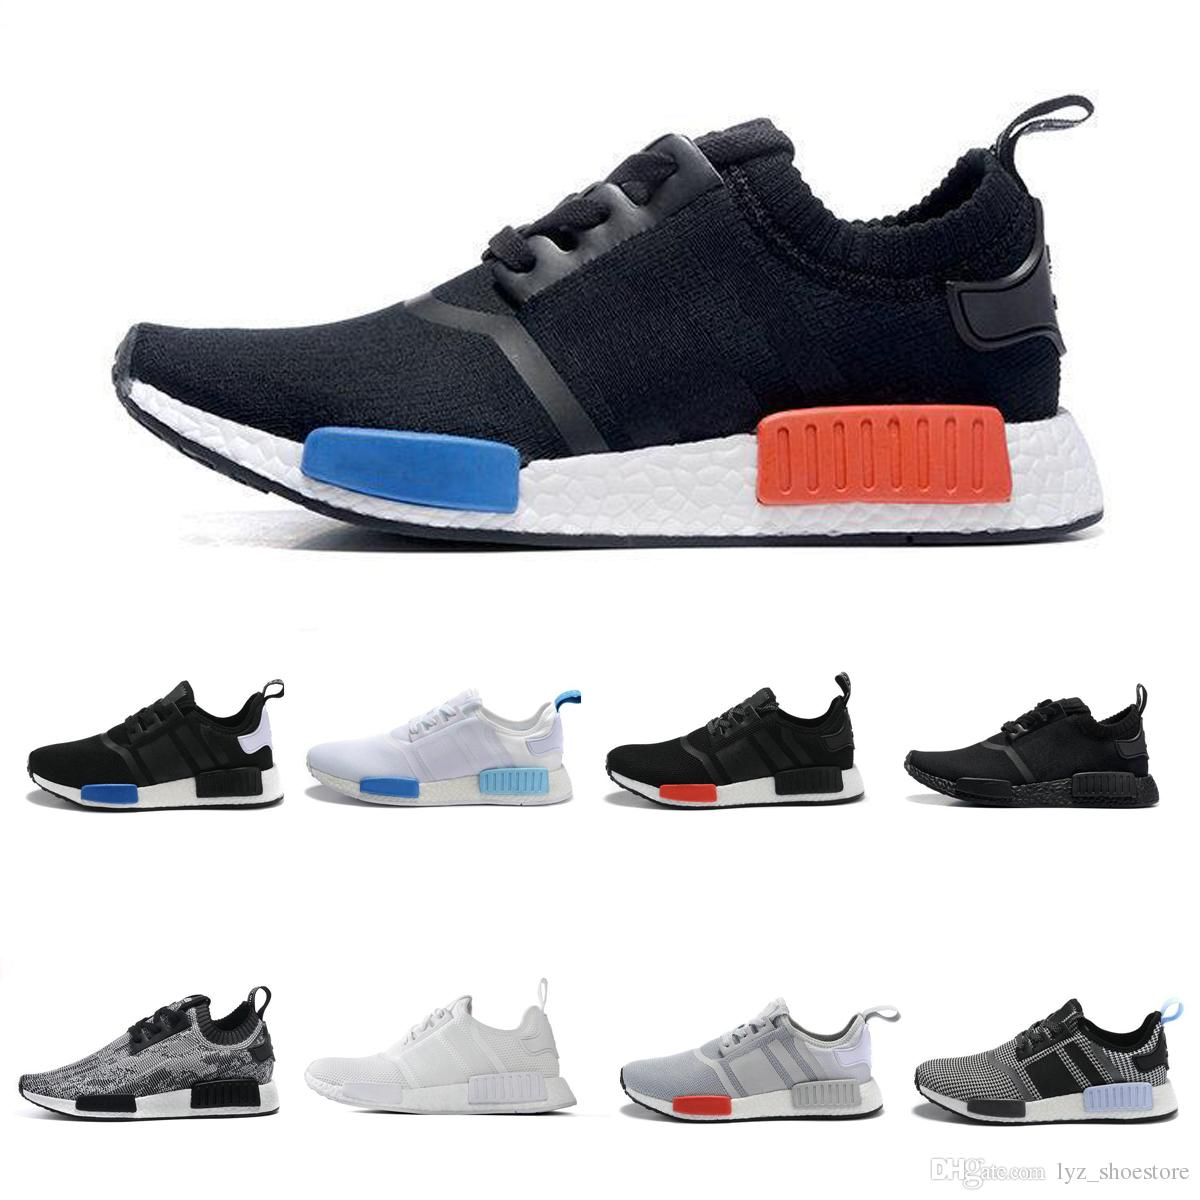 super popular ac231 e75f5 Compre Adidas Nmd R1 Boost Shoes 2017 NMD Runner R2 R1 Primeknit Blanco  Rojo Azul NMD Runner Calzado Deportivo Hombres Mujer NMD Zapatos Impulsar  Zapatillas ...